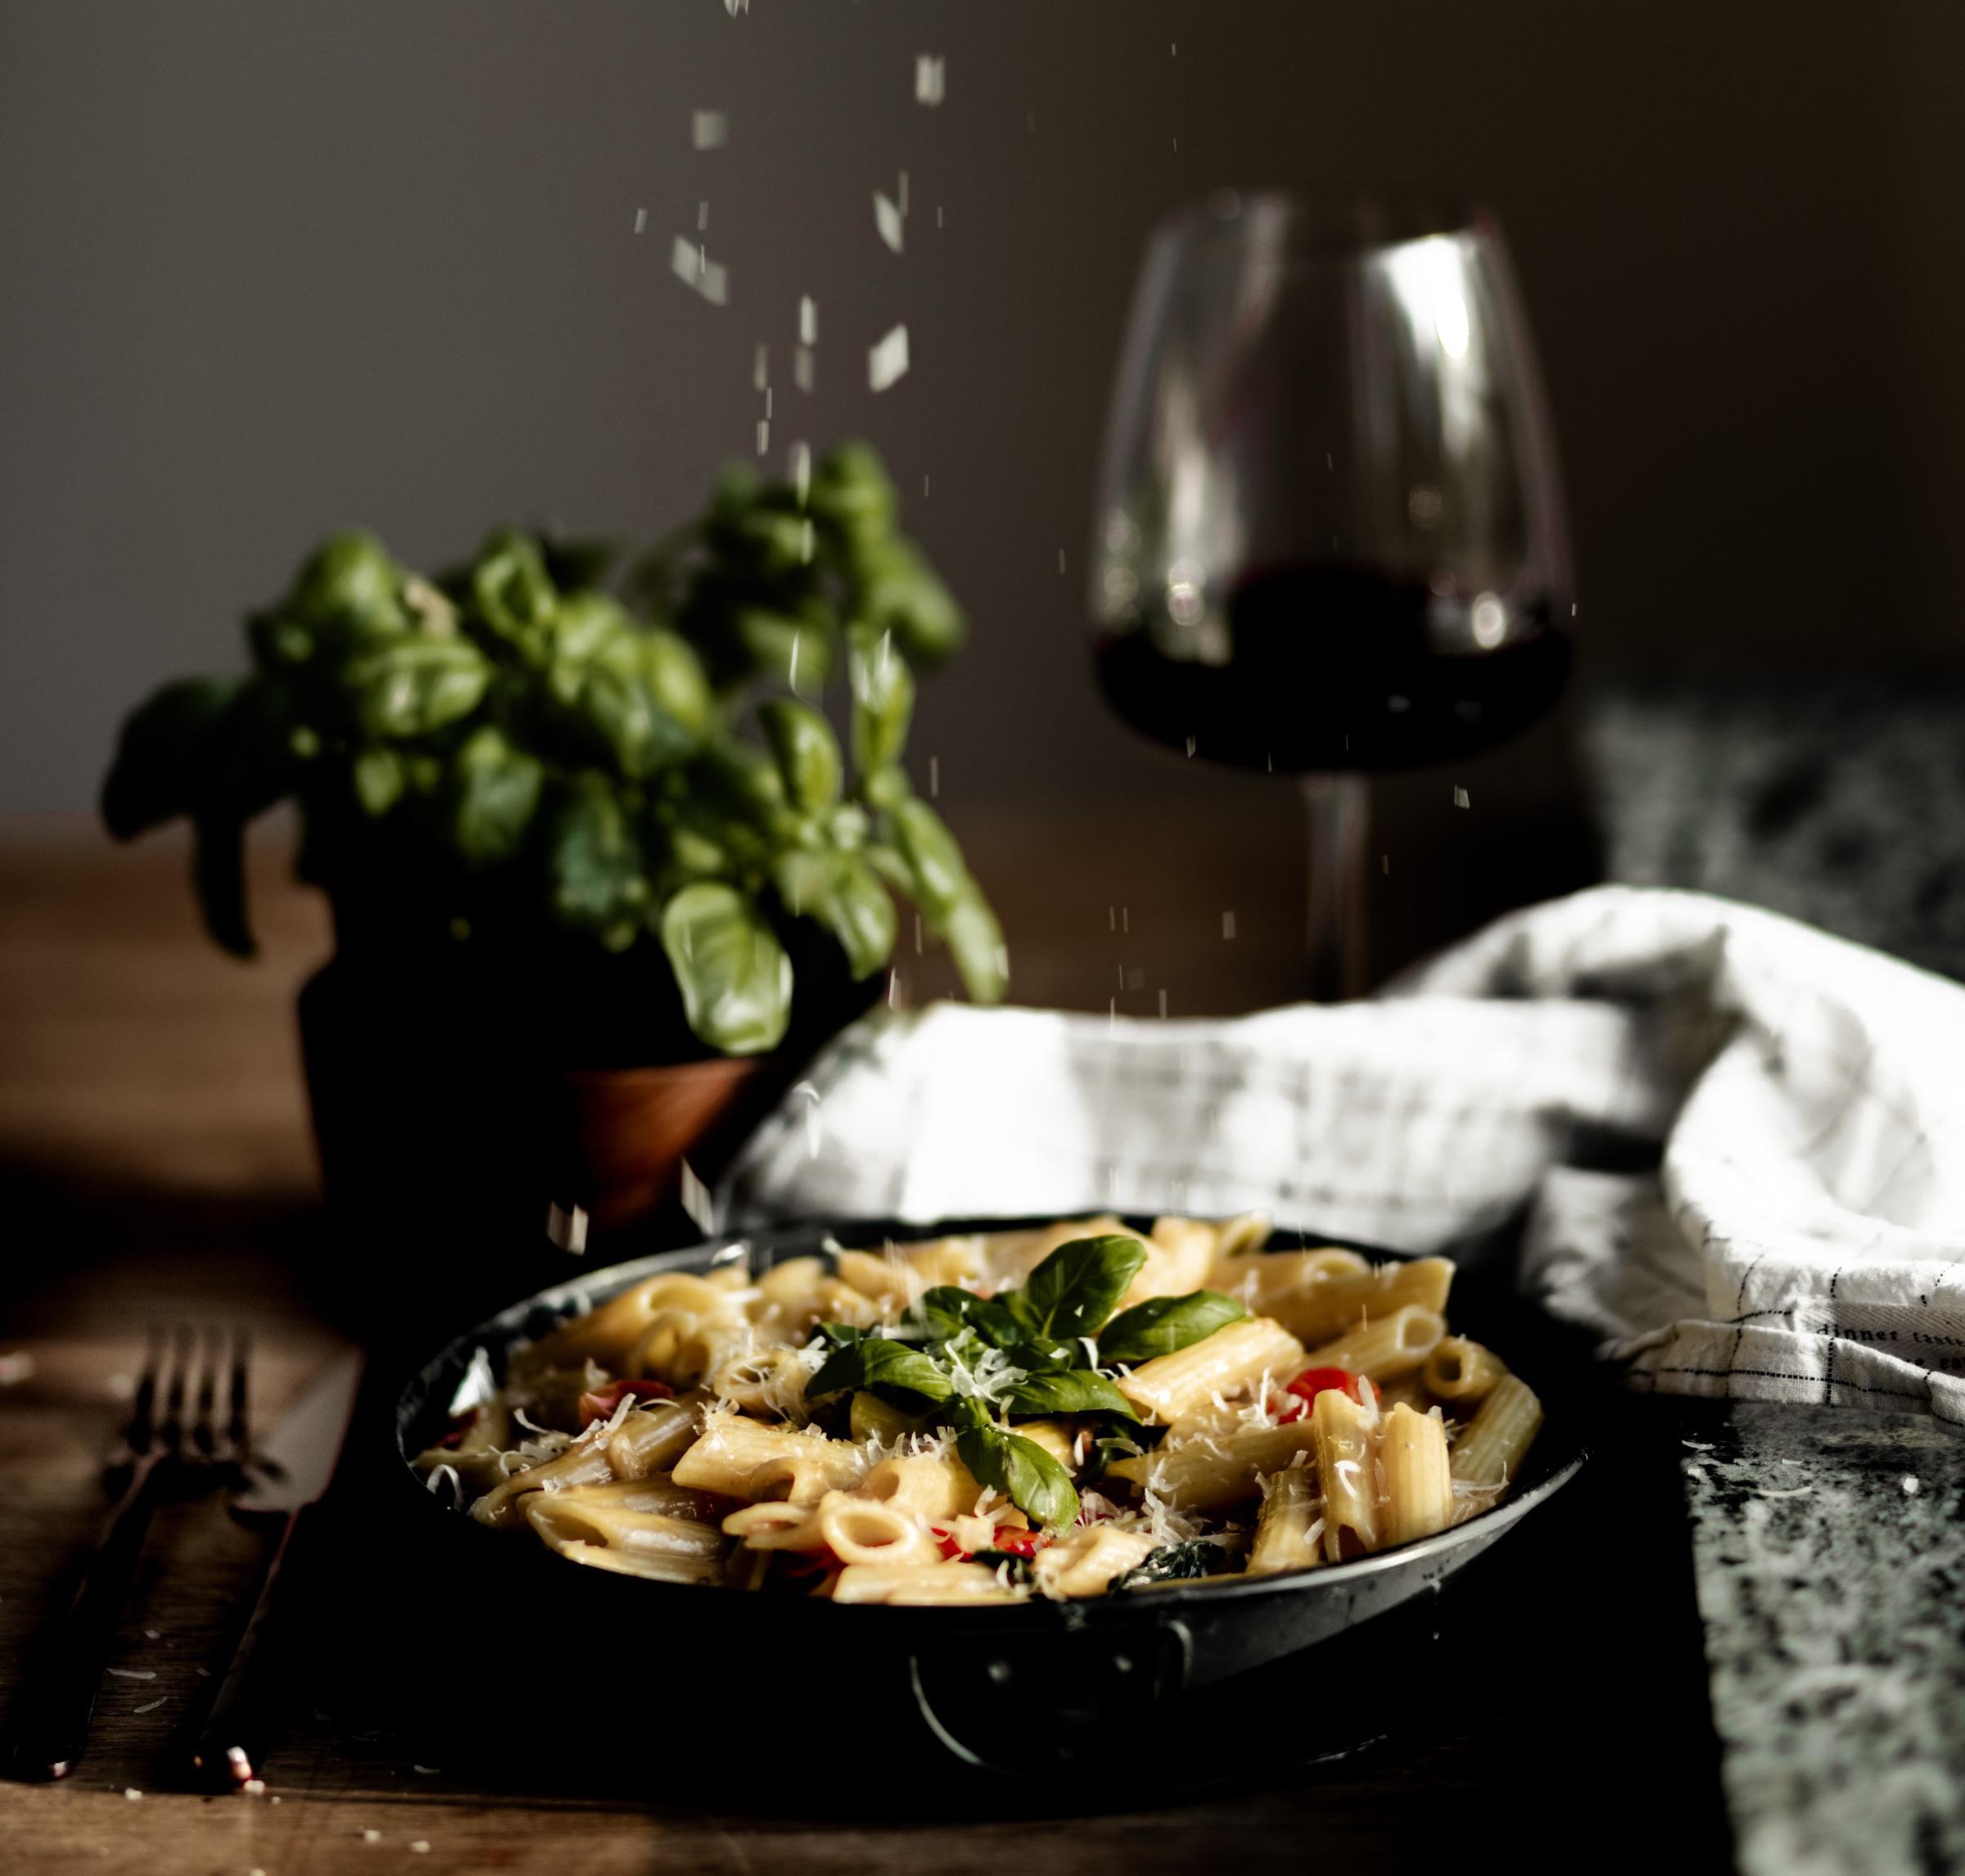 https://a.storyblok.com/f/105614/4324x4127/0980e4dcbb/pasta-rodvin.jpg